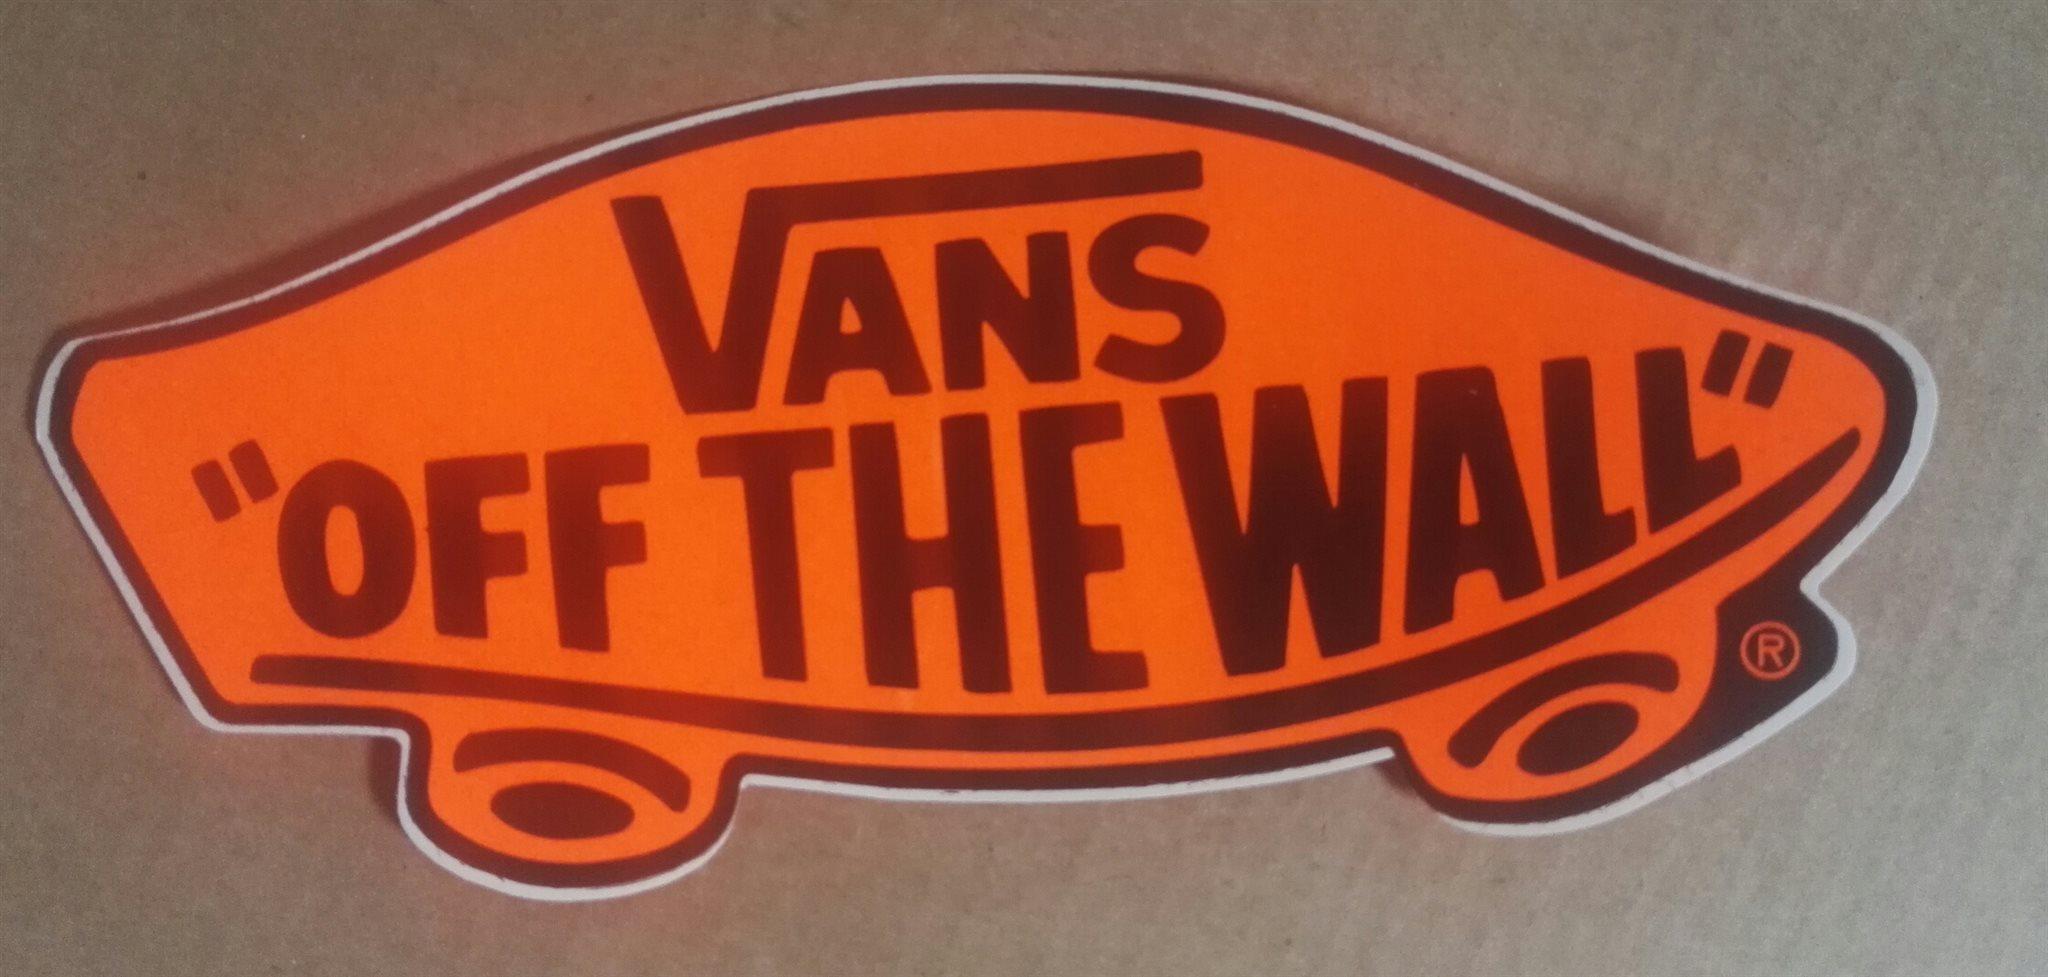 vans Off The Wall köp